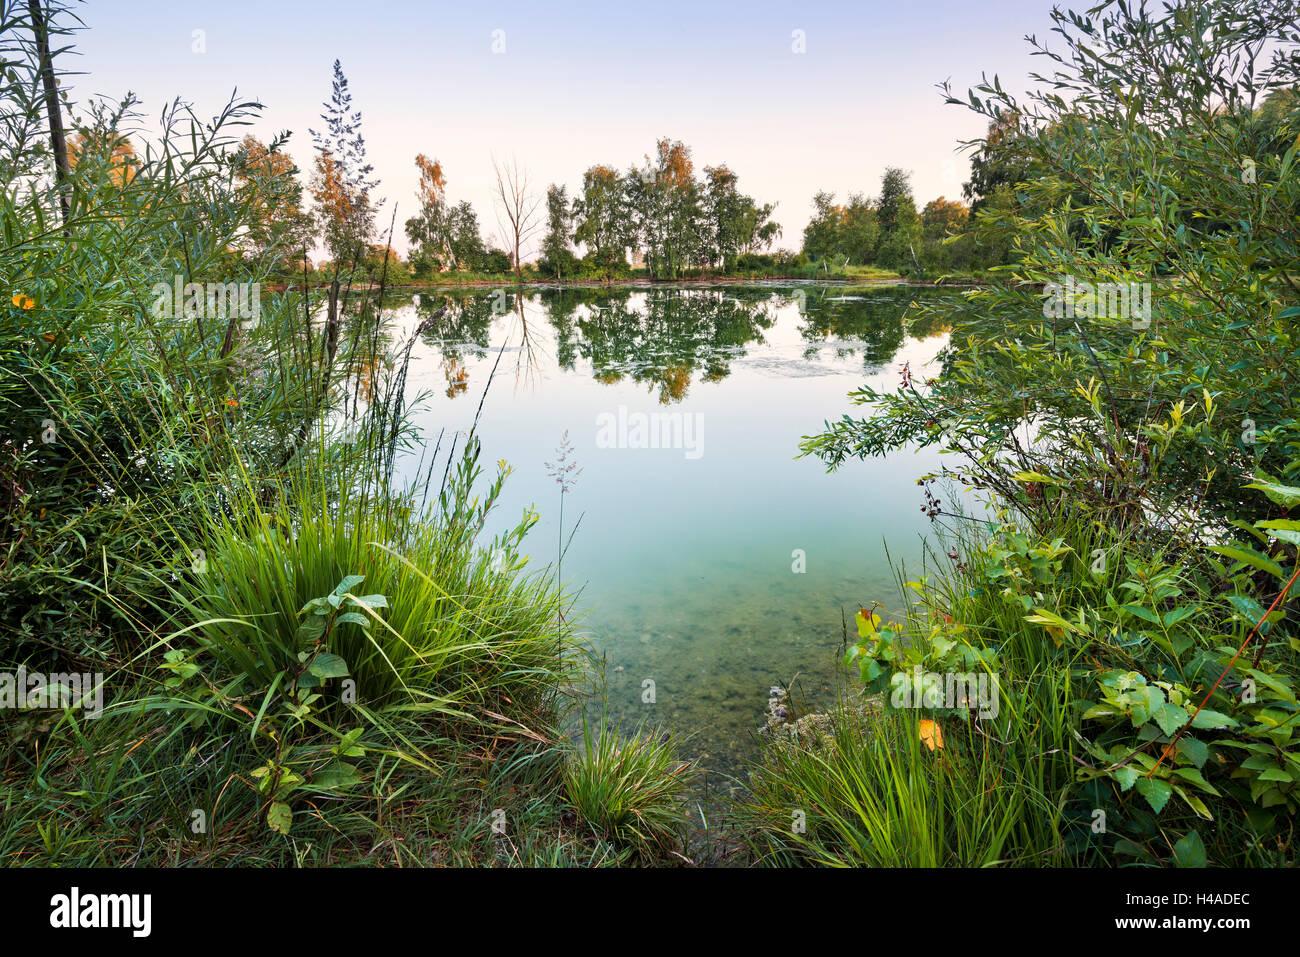 Germany, Bavaria, 'Augsburg Land' (district), lake, - Stock Image